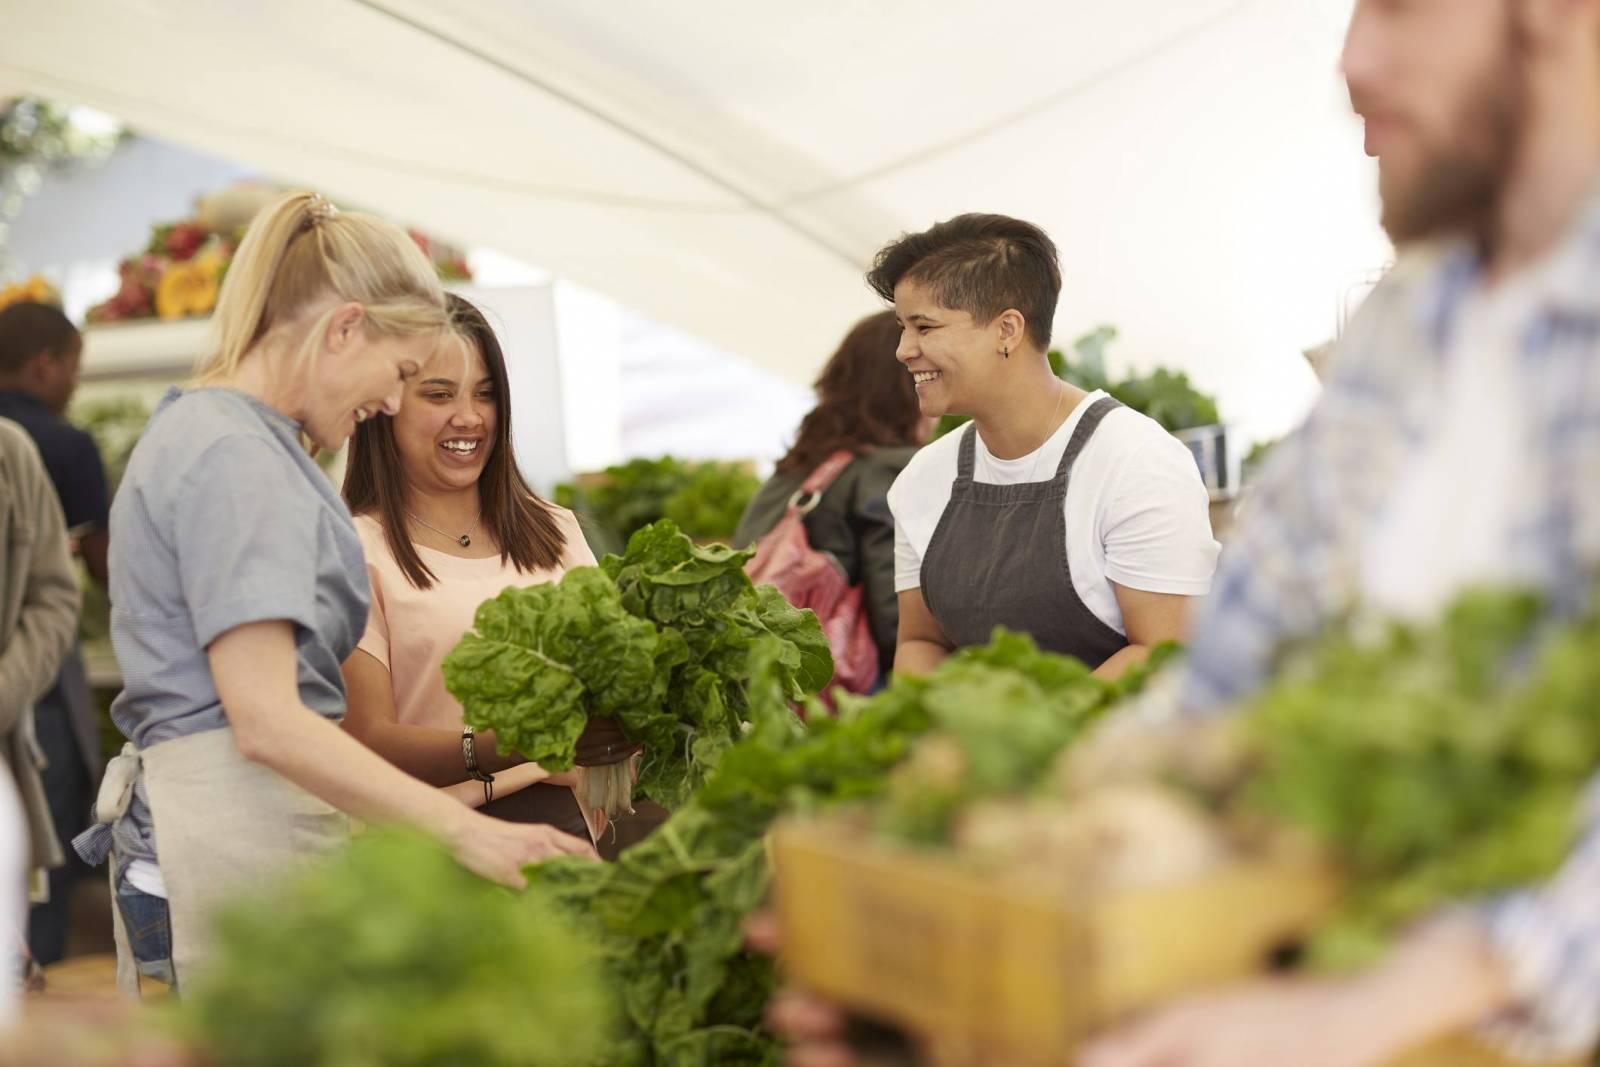 Women working, arranging vegetables at farmer's market